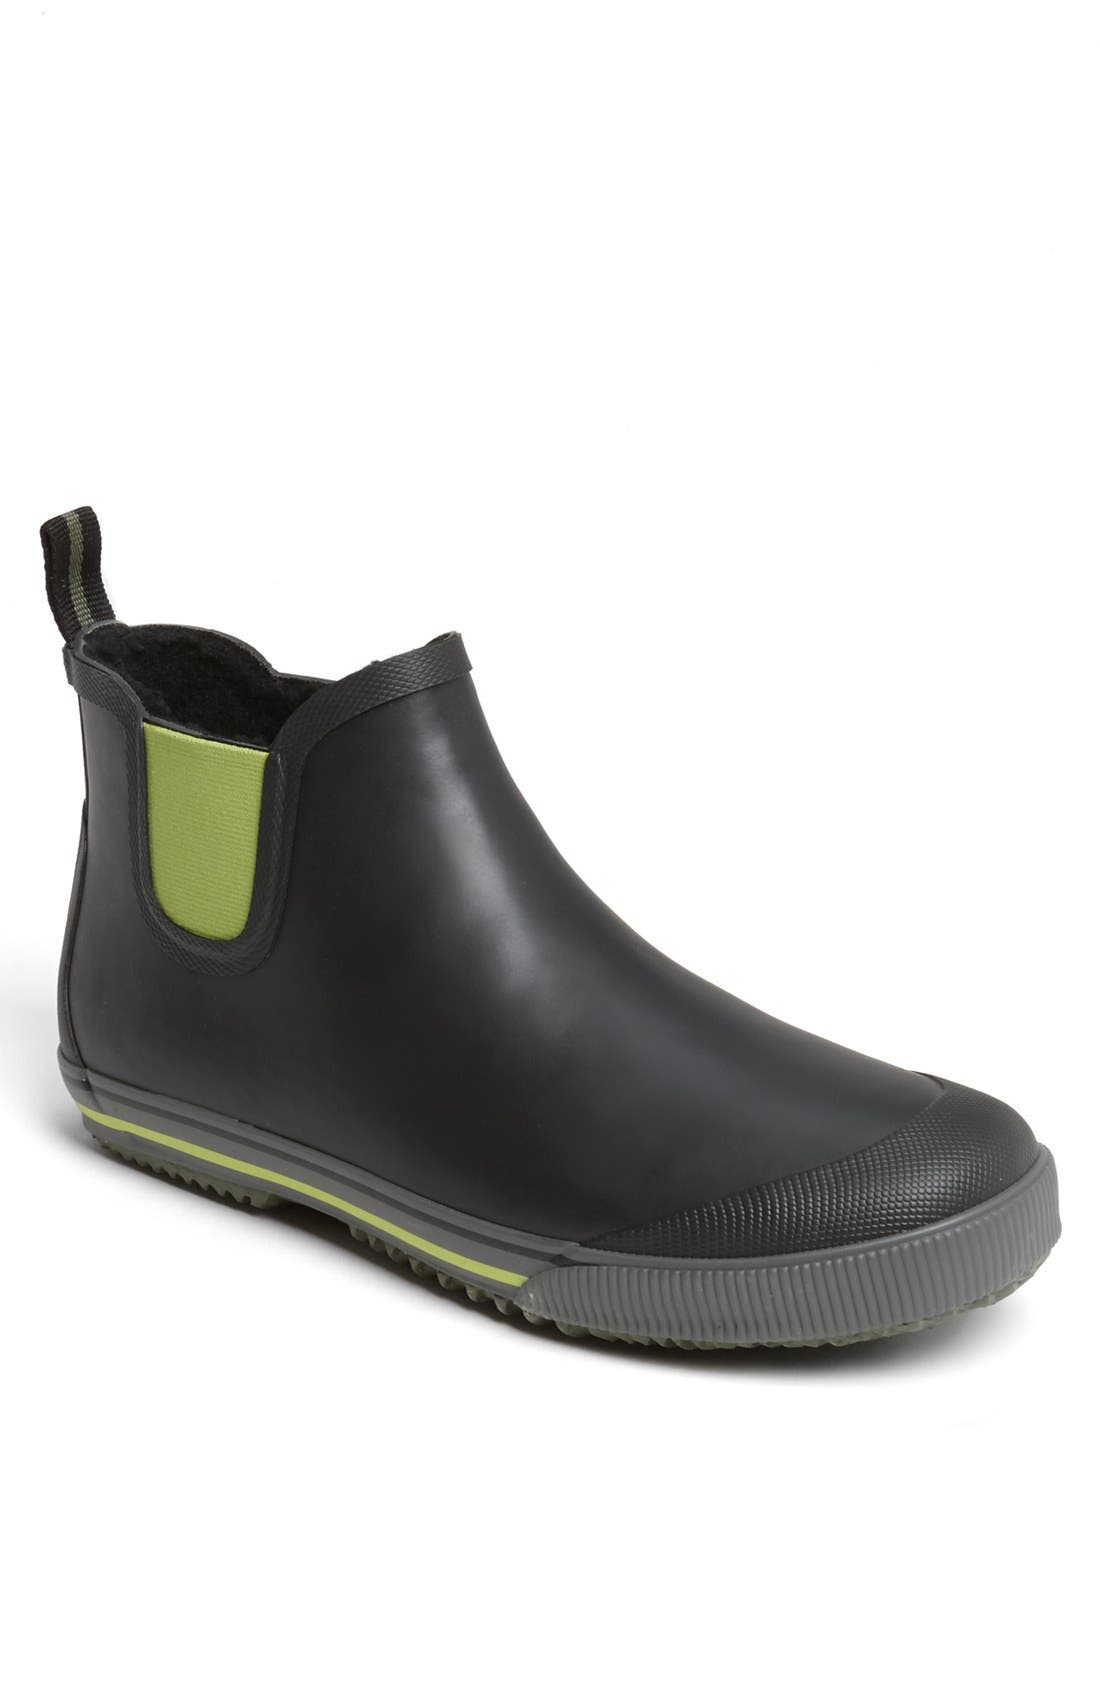 Main Image - Tretorn 'Stråla Vinter' Rain Boot (Online Only)